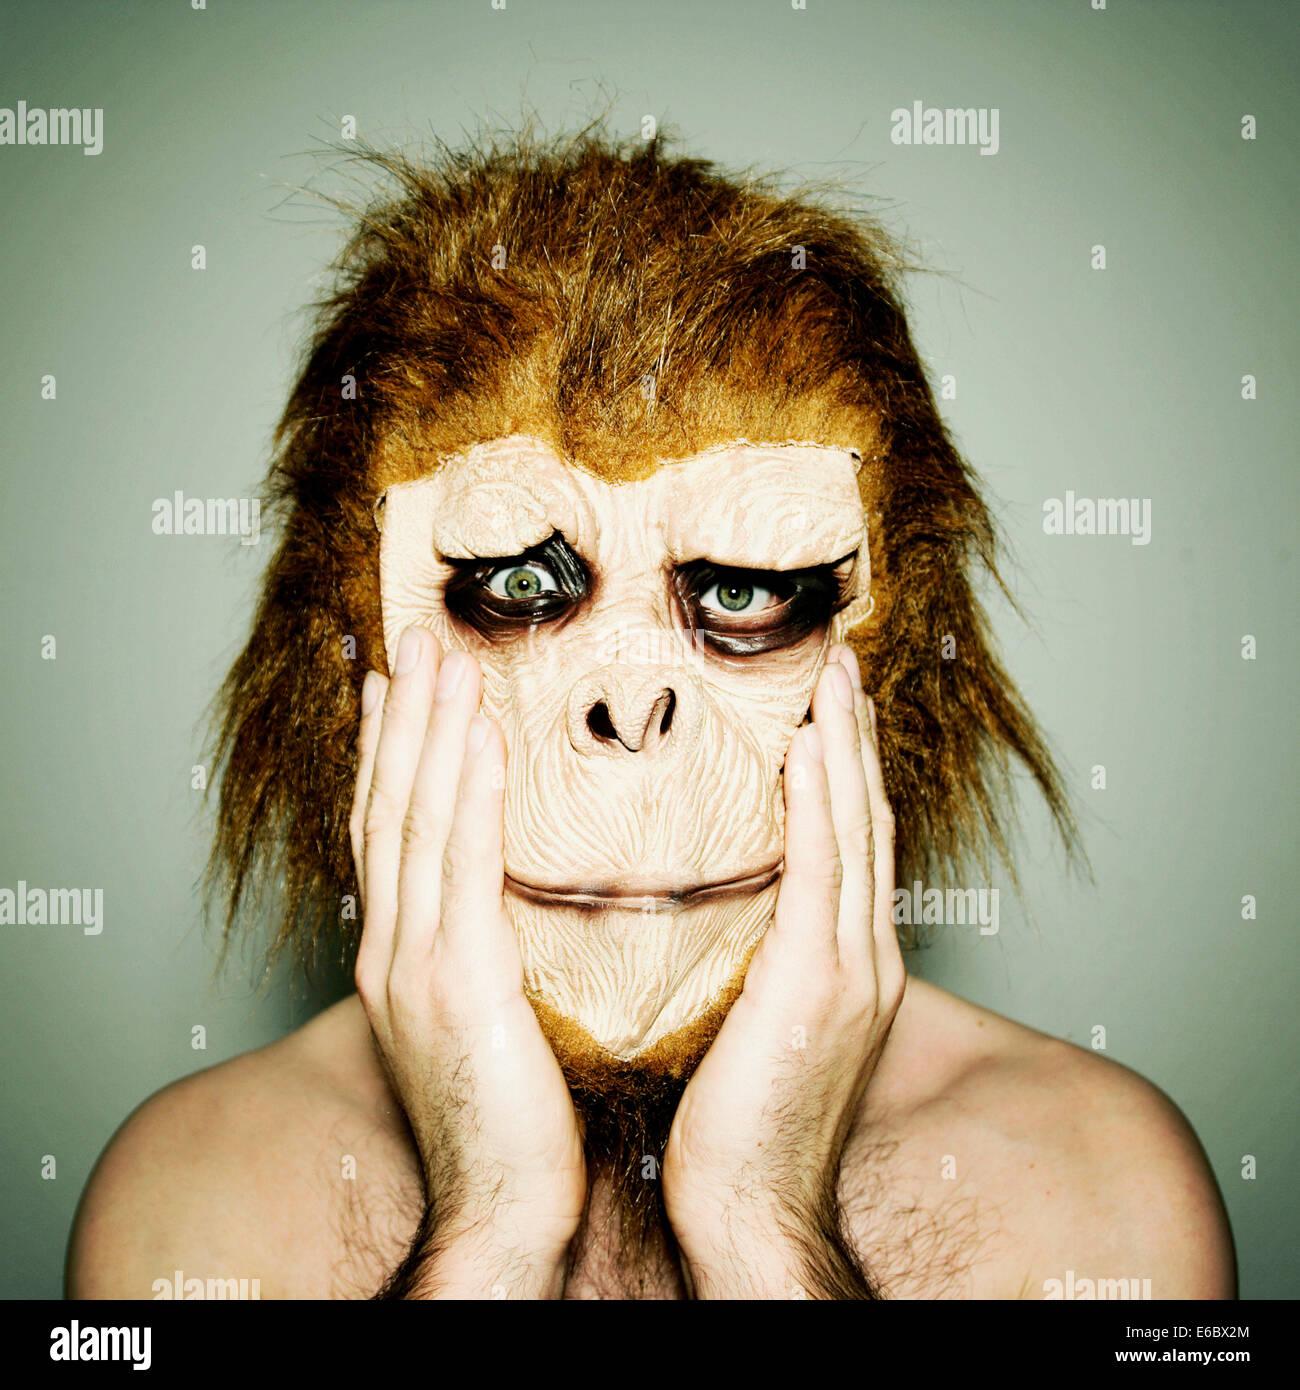 man,humor,bizarre,gorilla,monkey mask Stock Photo